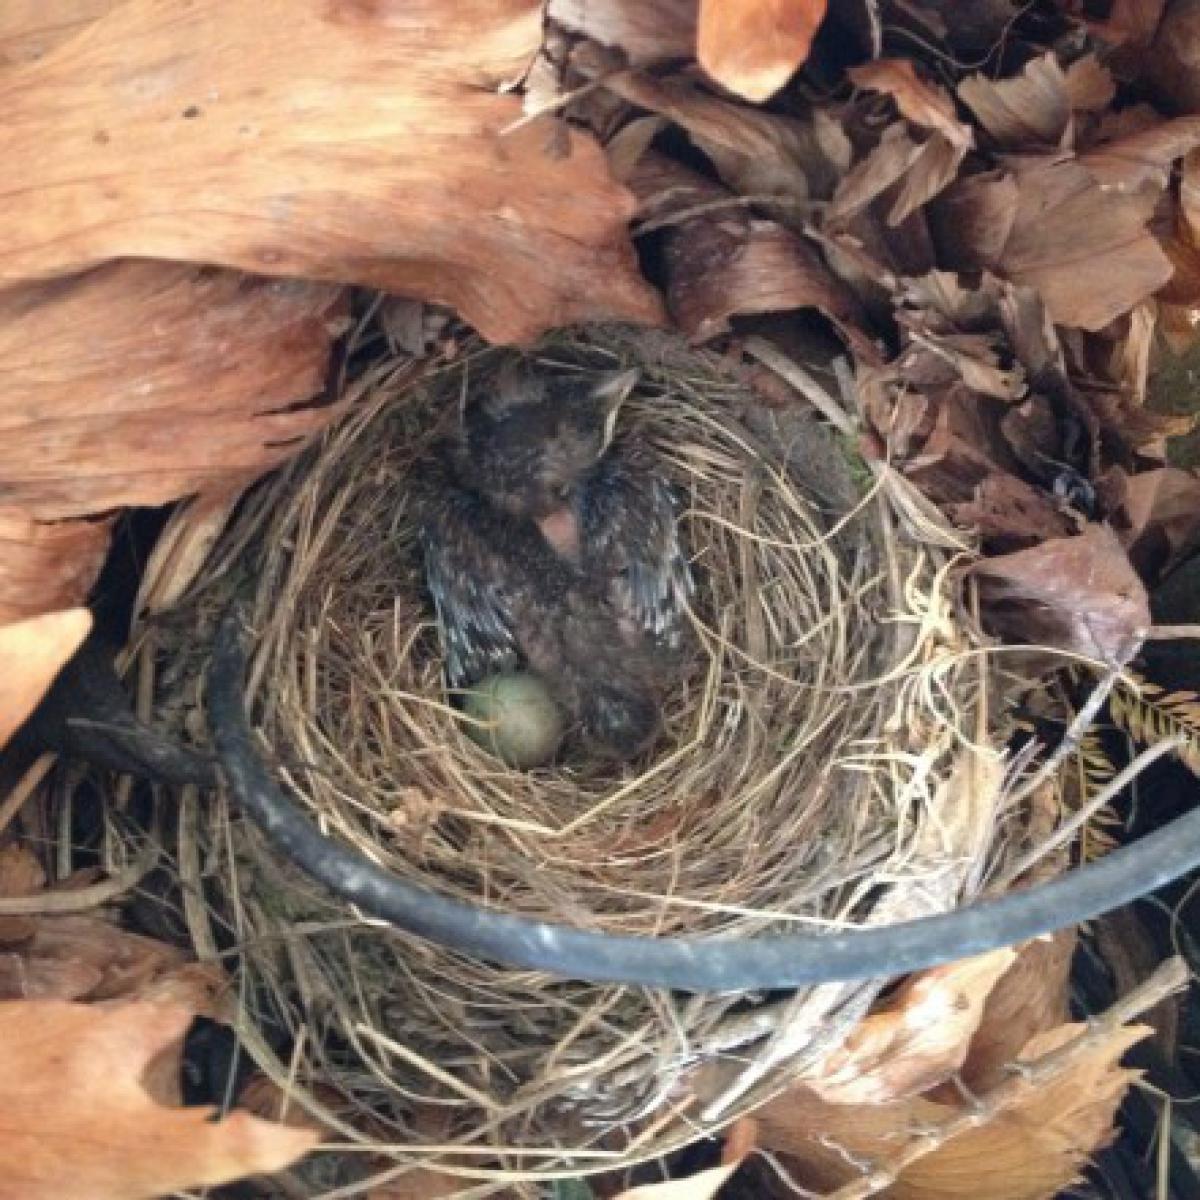 565 Blackbird nestling